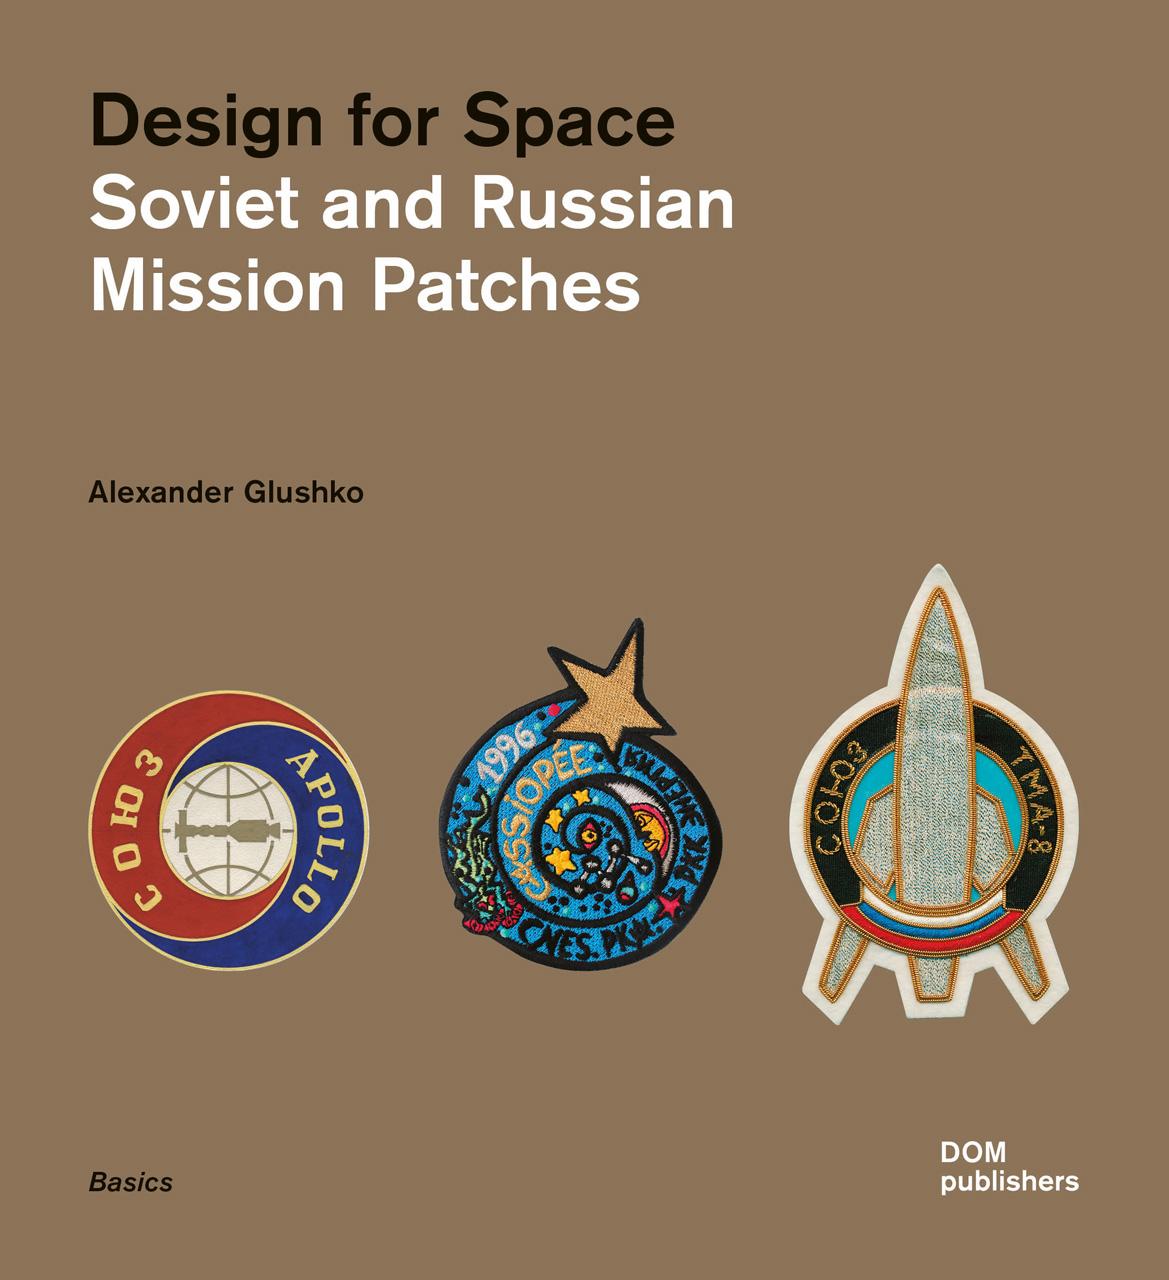 Design for Space Alexander Glushko 9783869223285